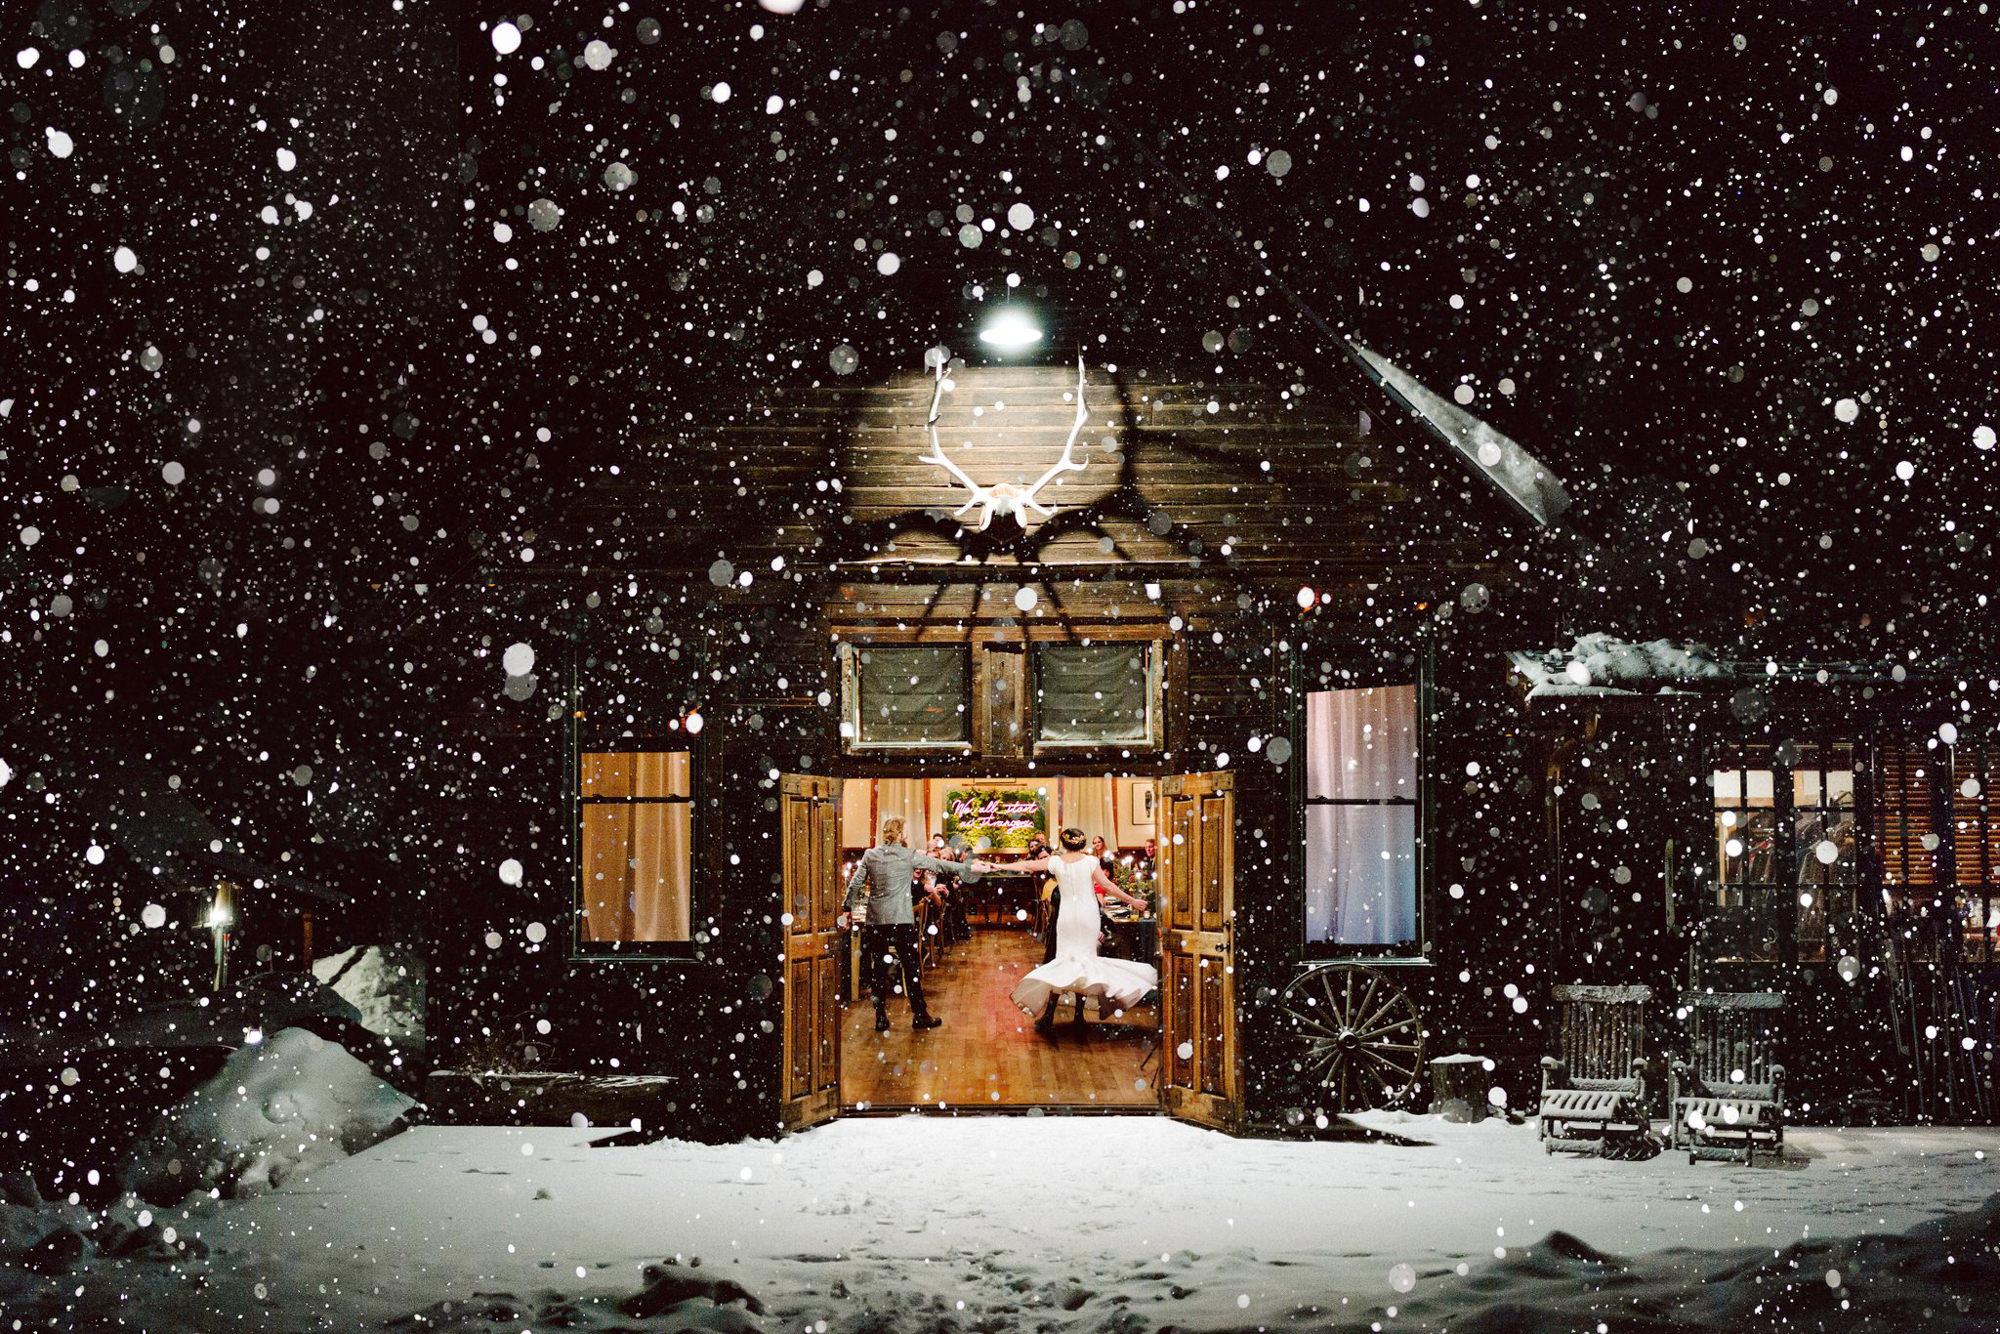 First dance in barn on snowy night - Photo by Benj Haisch - Seattle